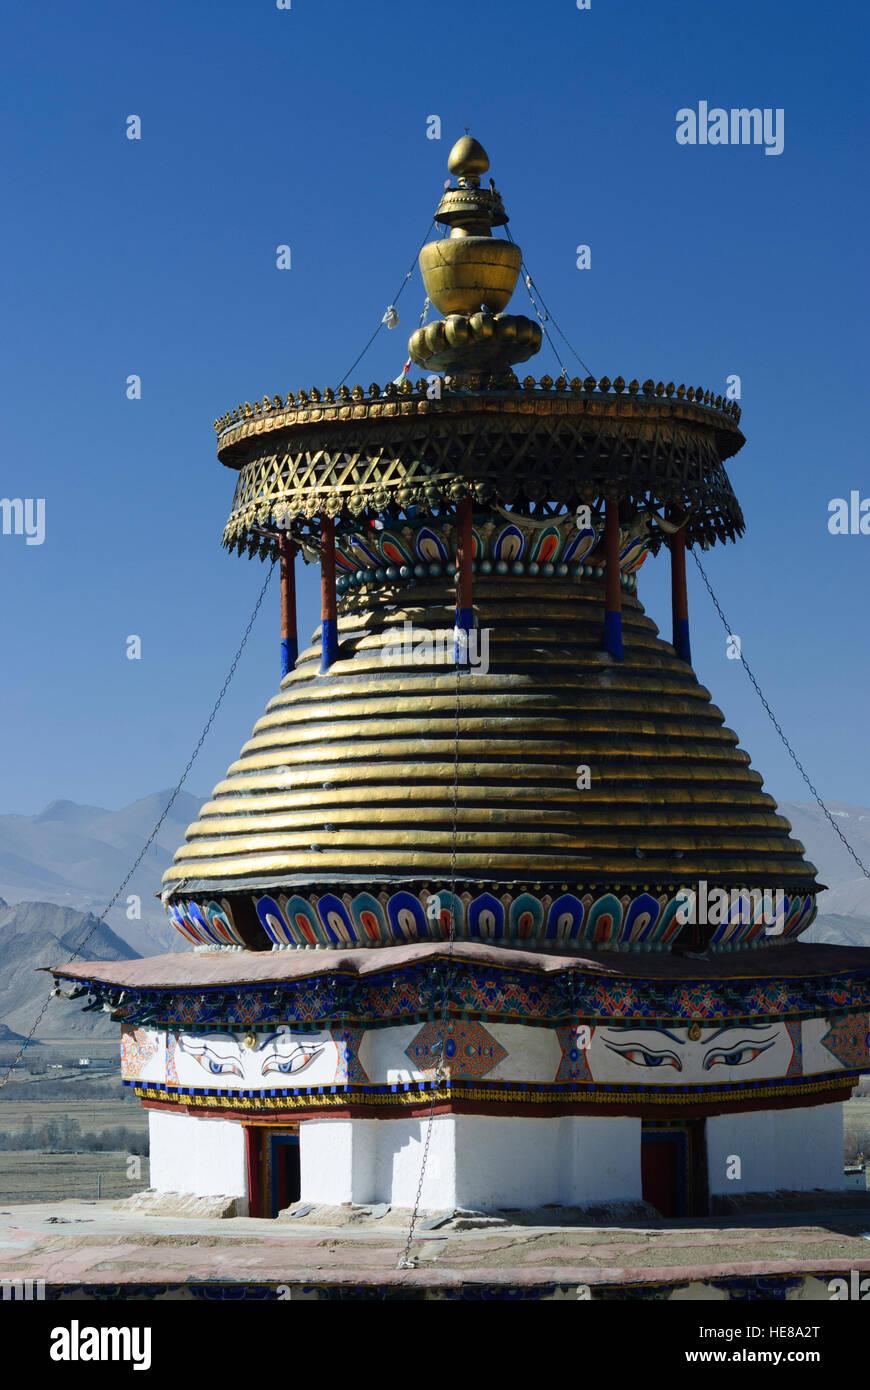 Gyantse: Pelkor Chöde - Monastery; Gyantse Kumbum (a Chörten), Tibet, China - Stock Image